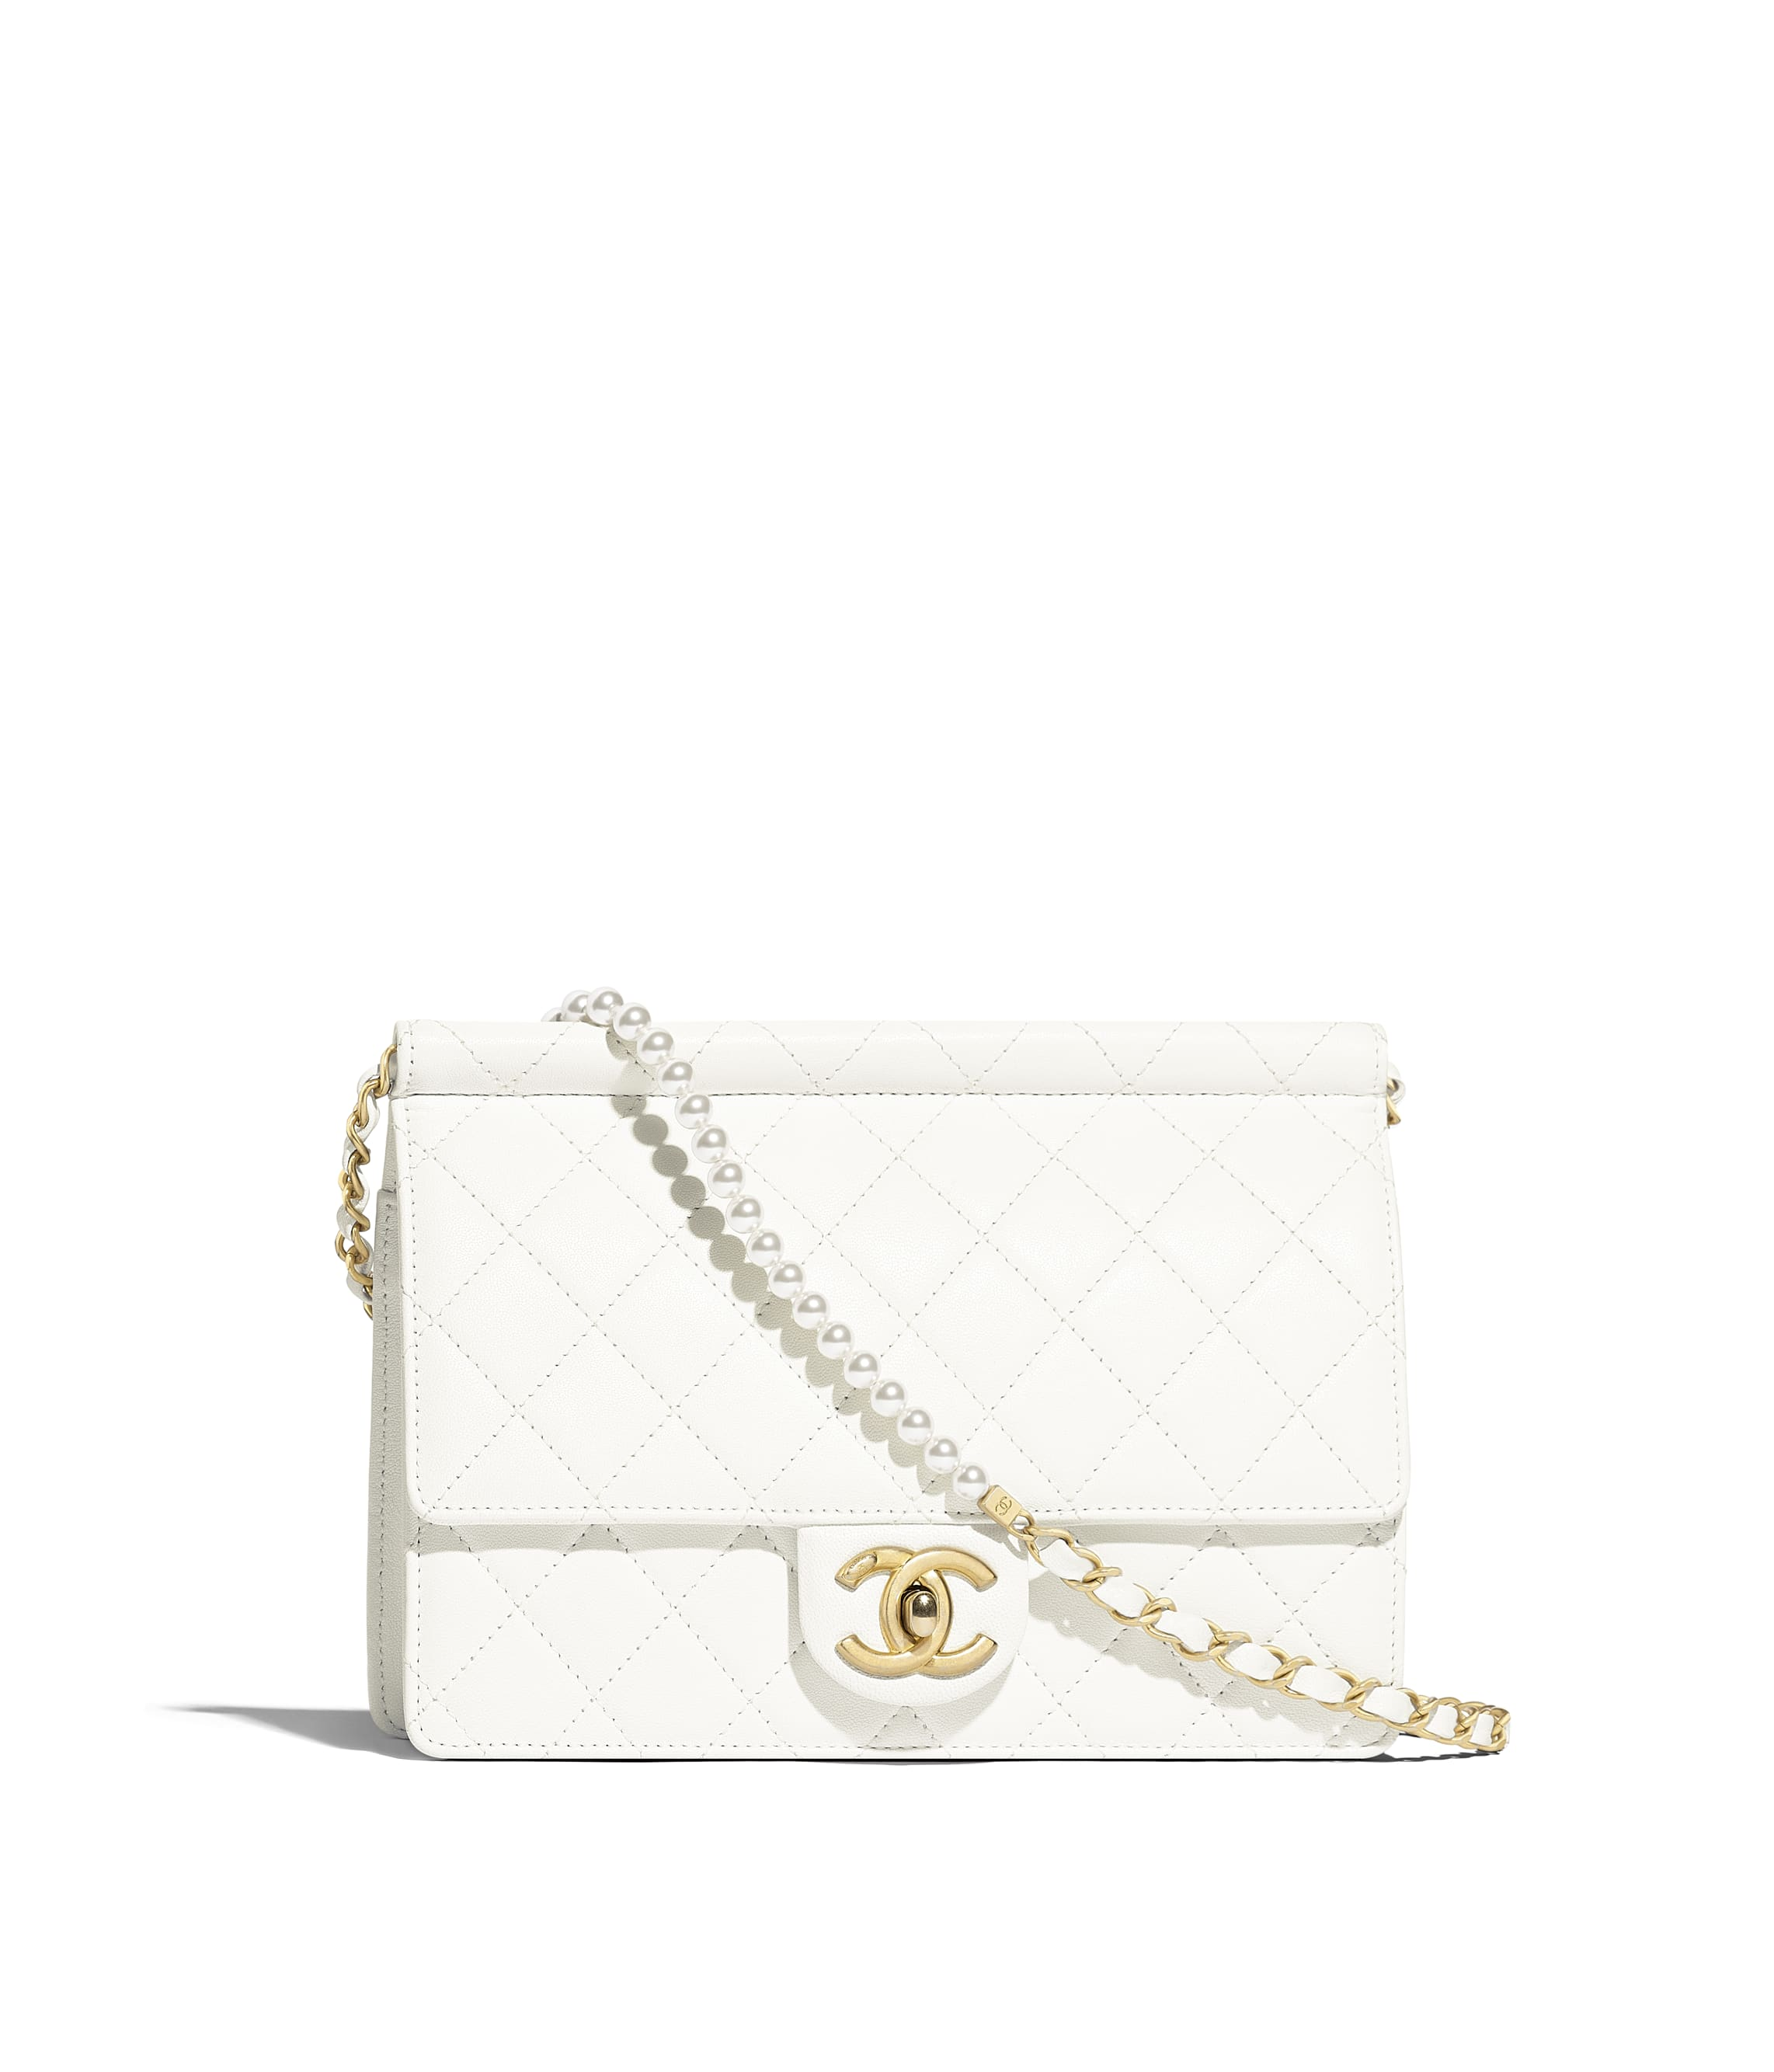 f796e72f53b24f Flap Bag, lambskin, imitation pearls & gold-tone metal, white - CHANEL